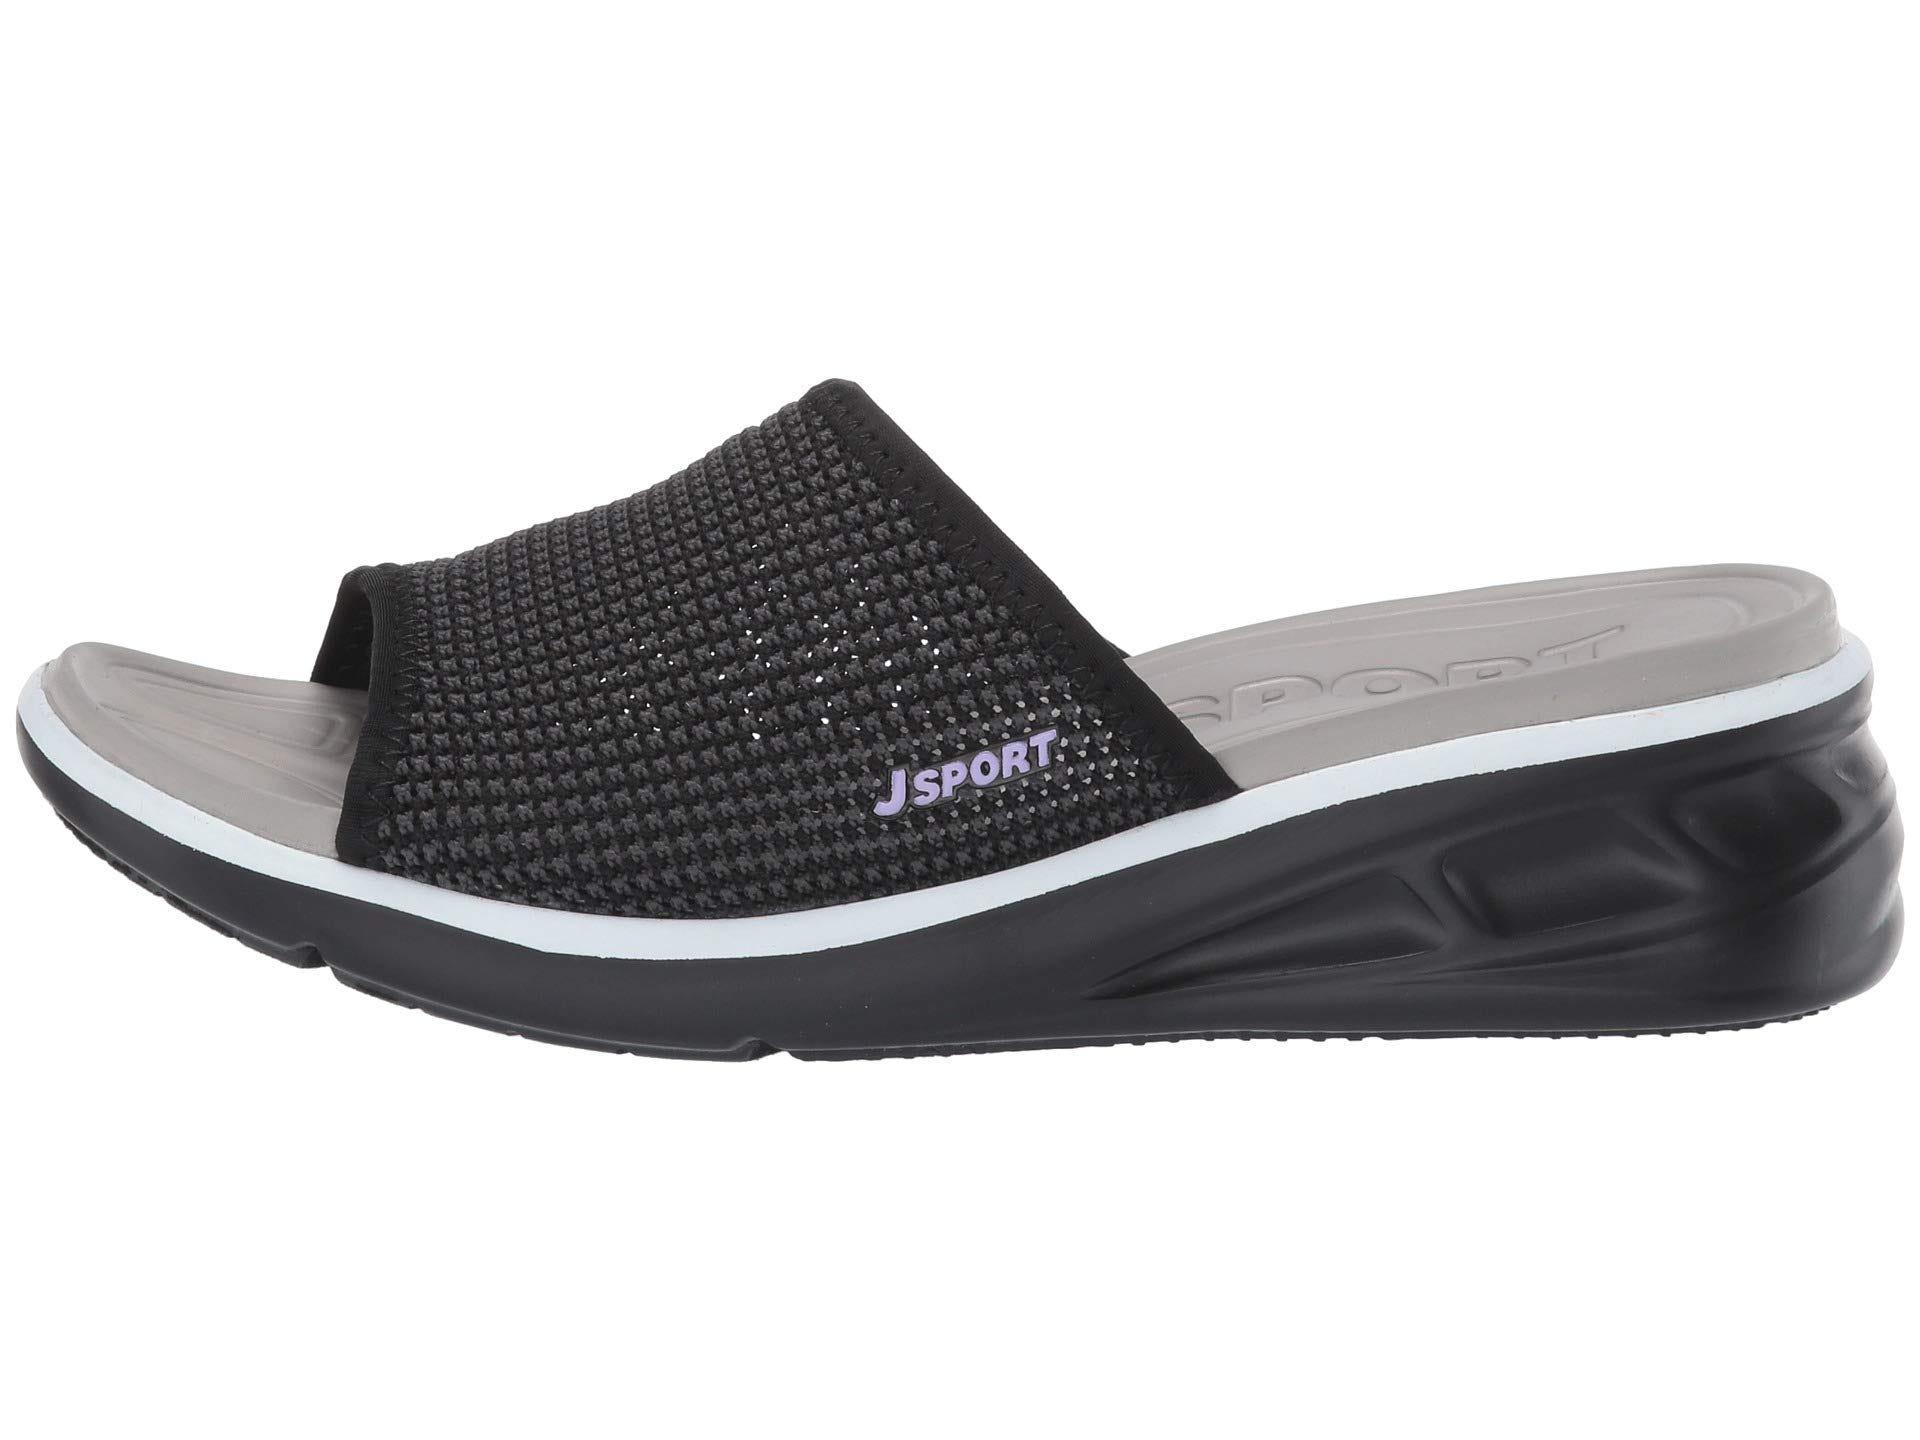 cc9d485f1 Everlane Wedge Sandal - Affordable